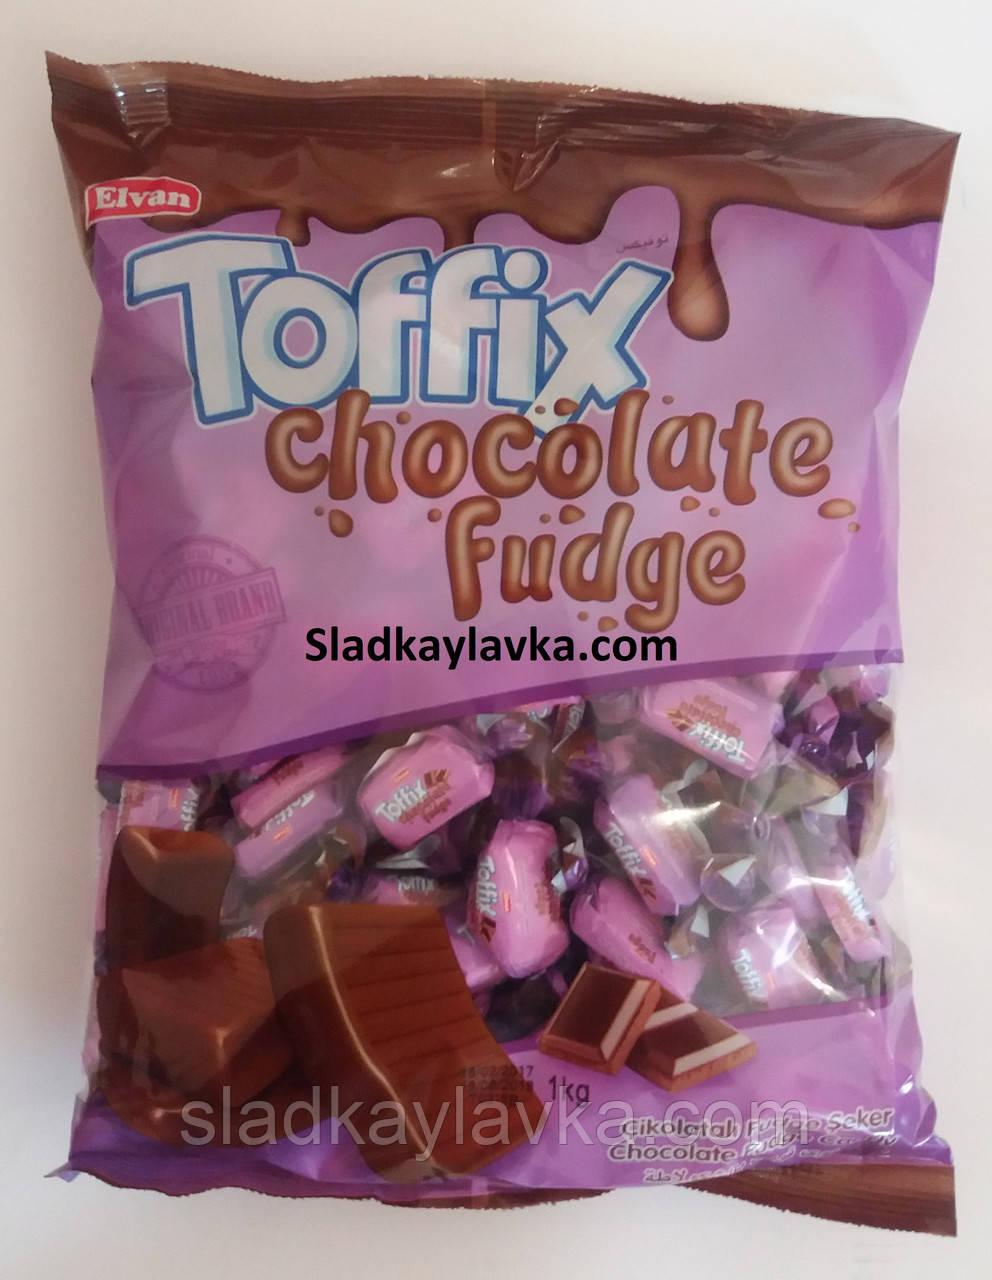 Жувальна цукерка Toffix Chocolate Fudge 1000 гр (Elvan)